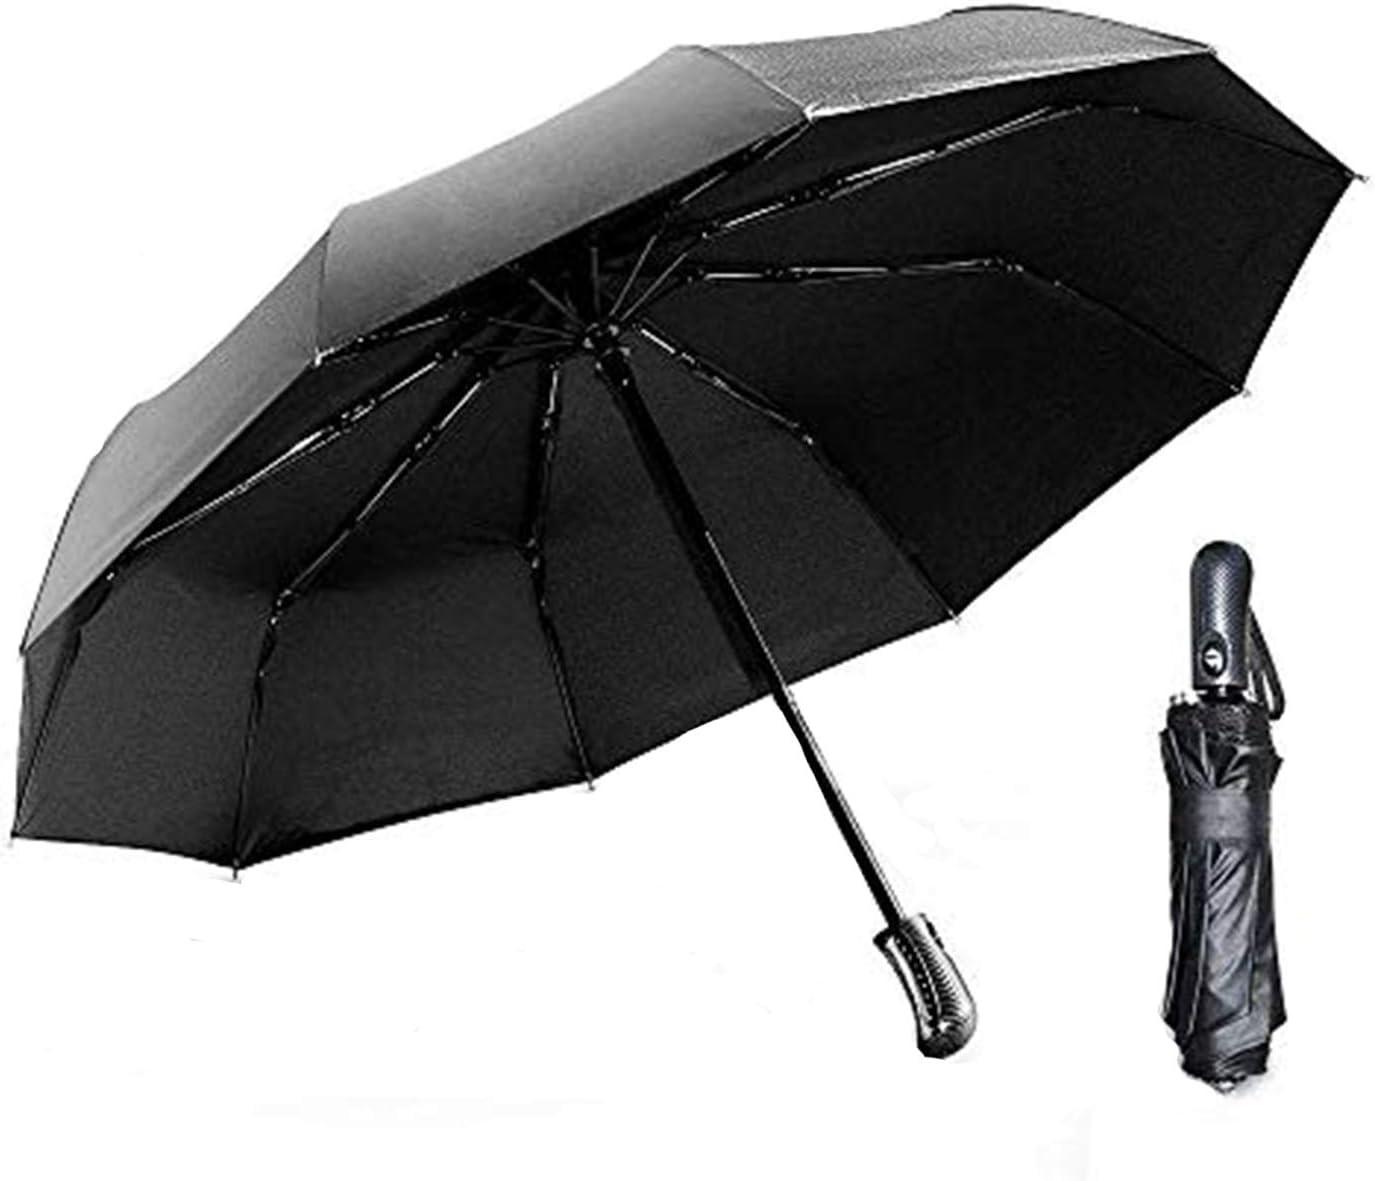 Windproof Anti-uv Sun Rain Umbrellas Colour Changing Compact Folding UK